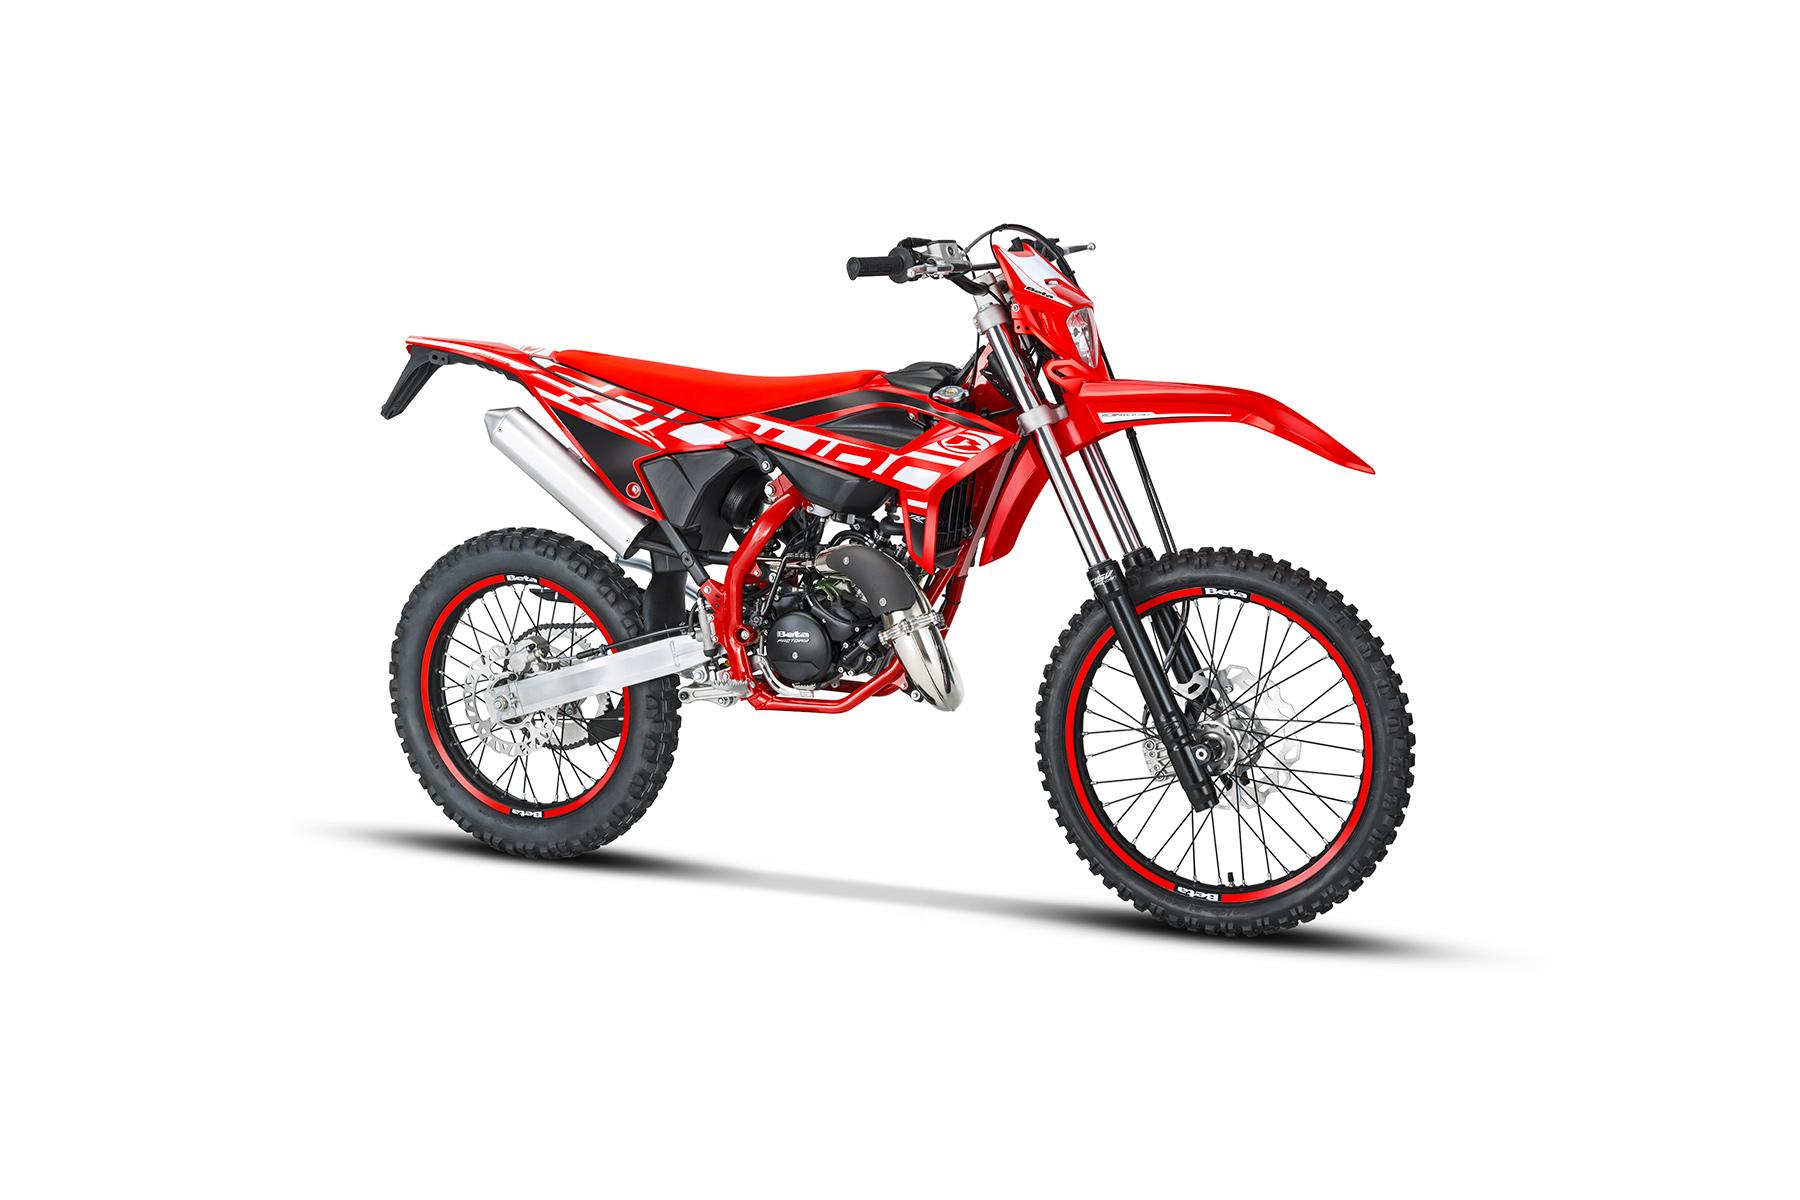 RR 50 my 2021